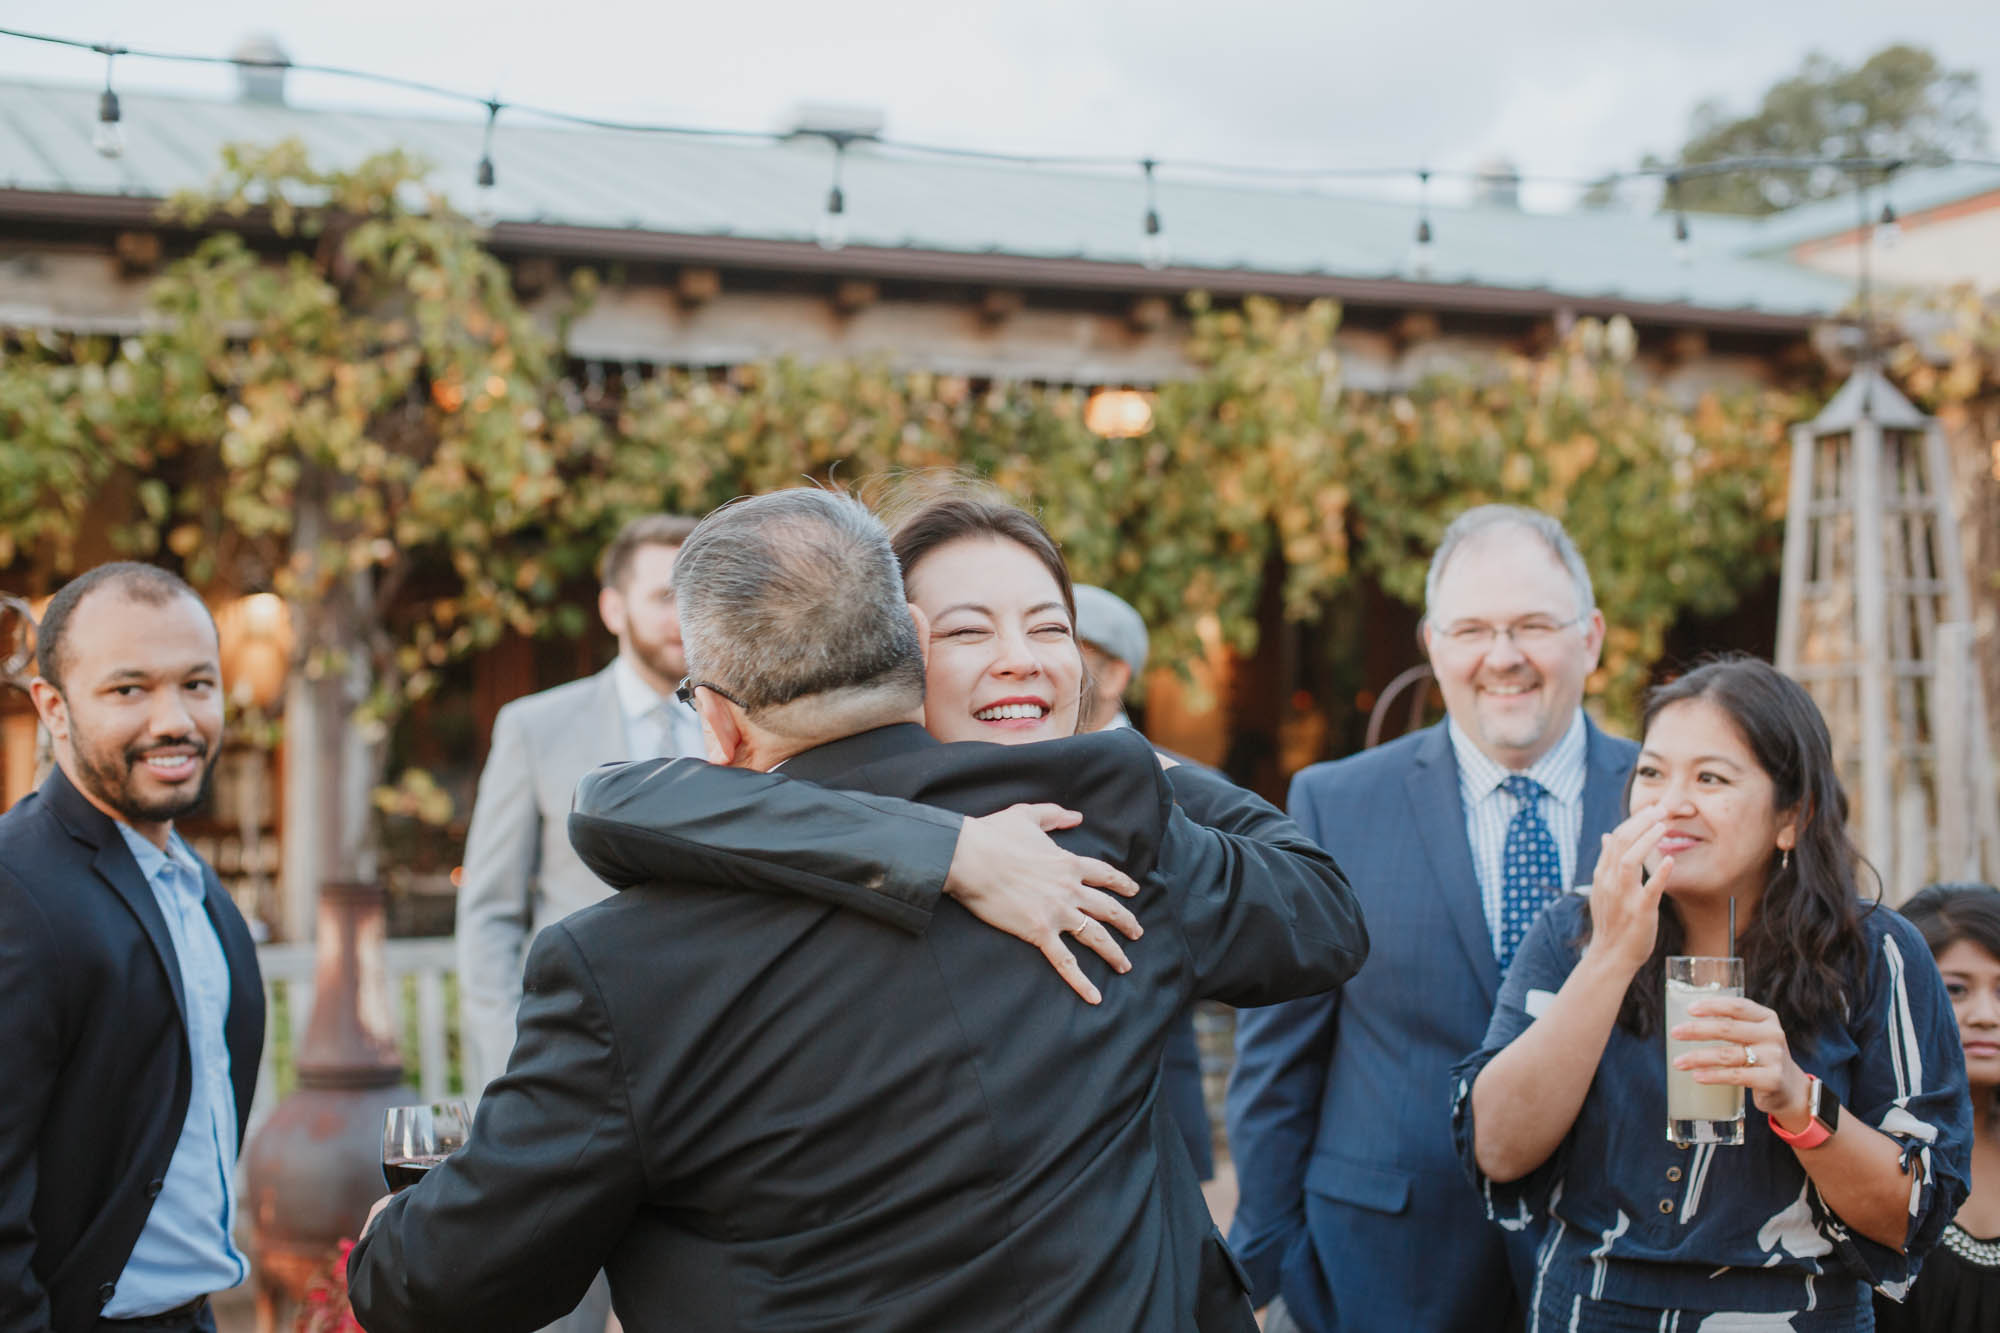 hastings-on-hudson-wedding-photographer-36.jpg